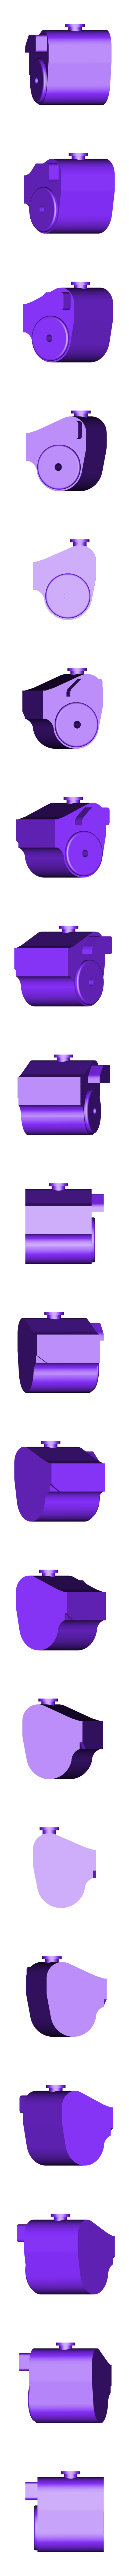 MakerBot_-_Rear_Engine-_SCALED-20.STL Download free STL file 4-8-8-4 Big Boy Locomotive • 3D printer object, RaymondDeLuca